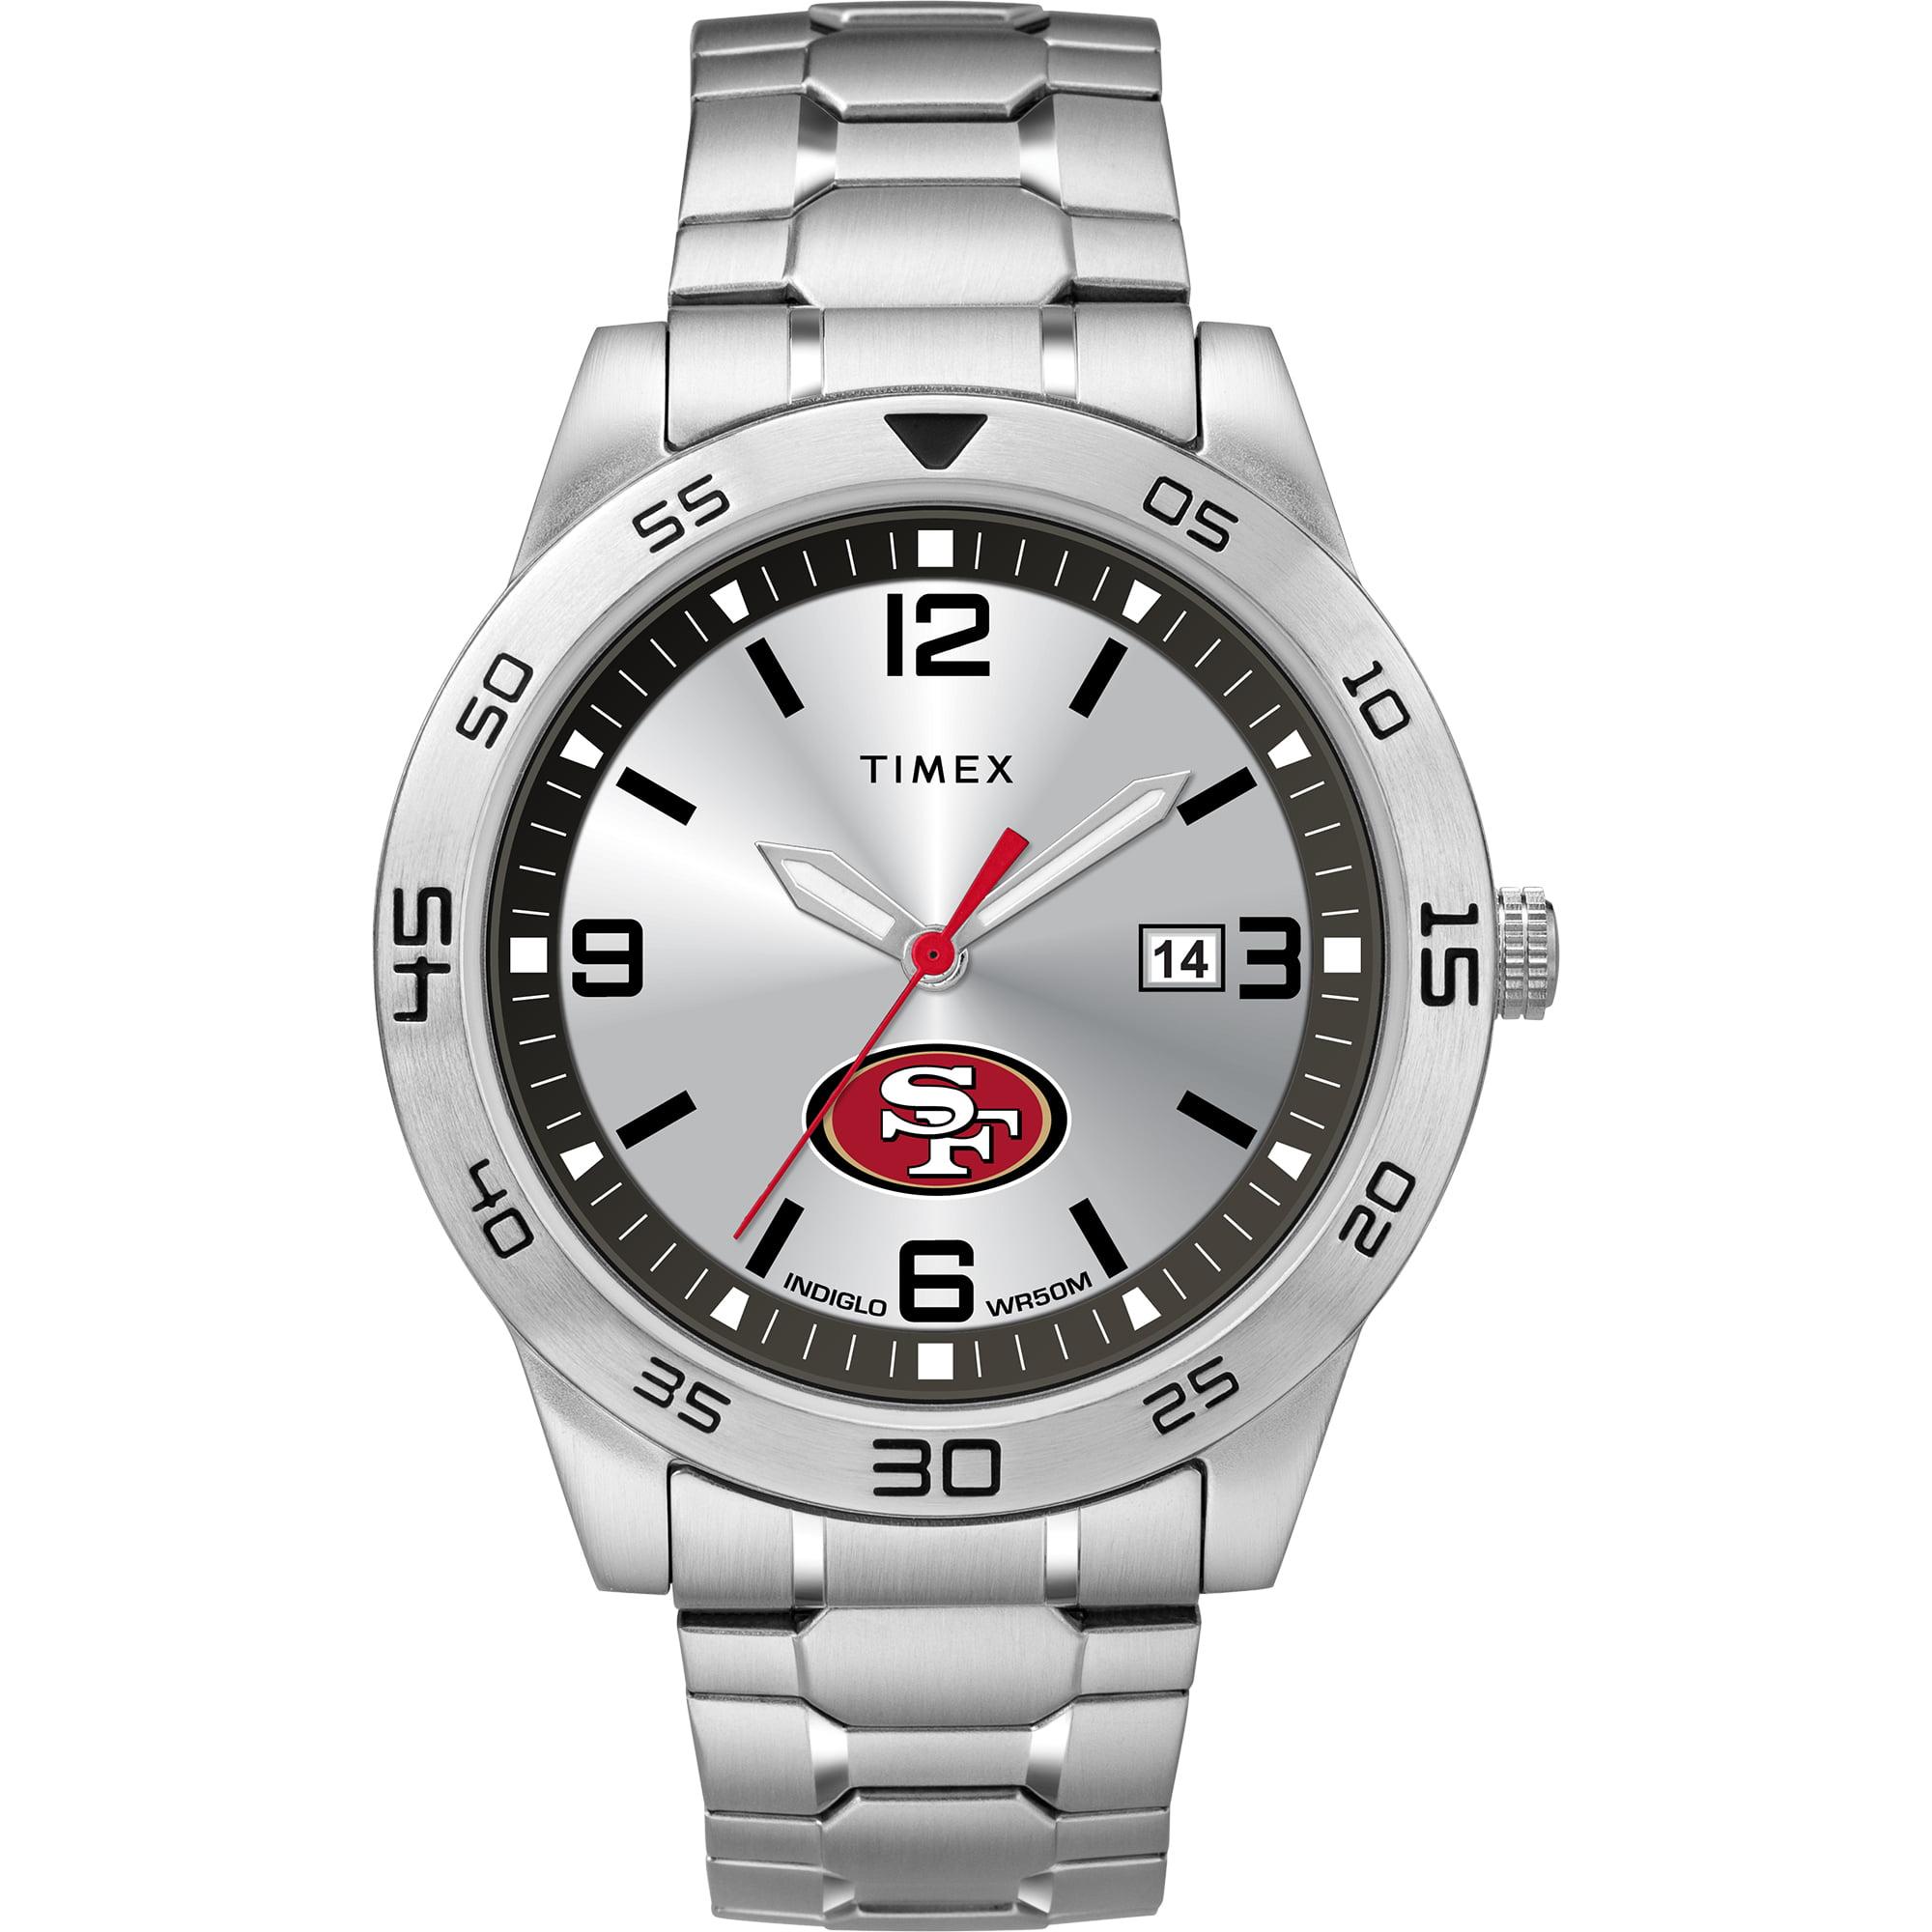 Timex - NFL Tribute Collection Citation Men's Watch, San Francisco 49ers